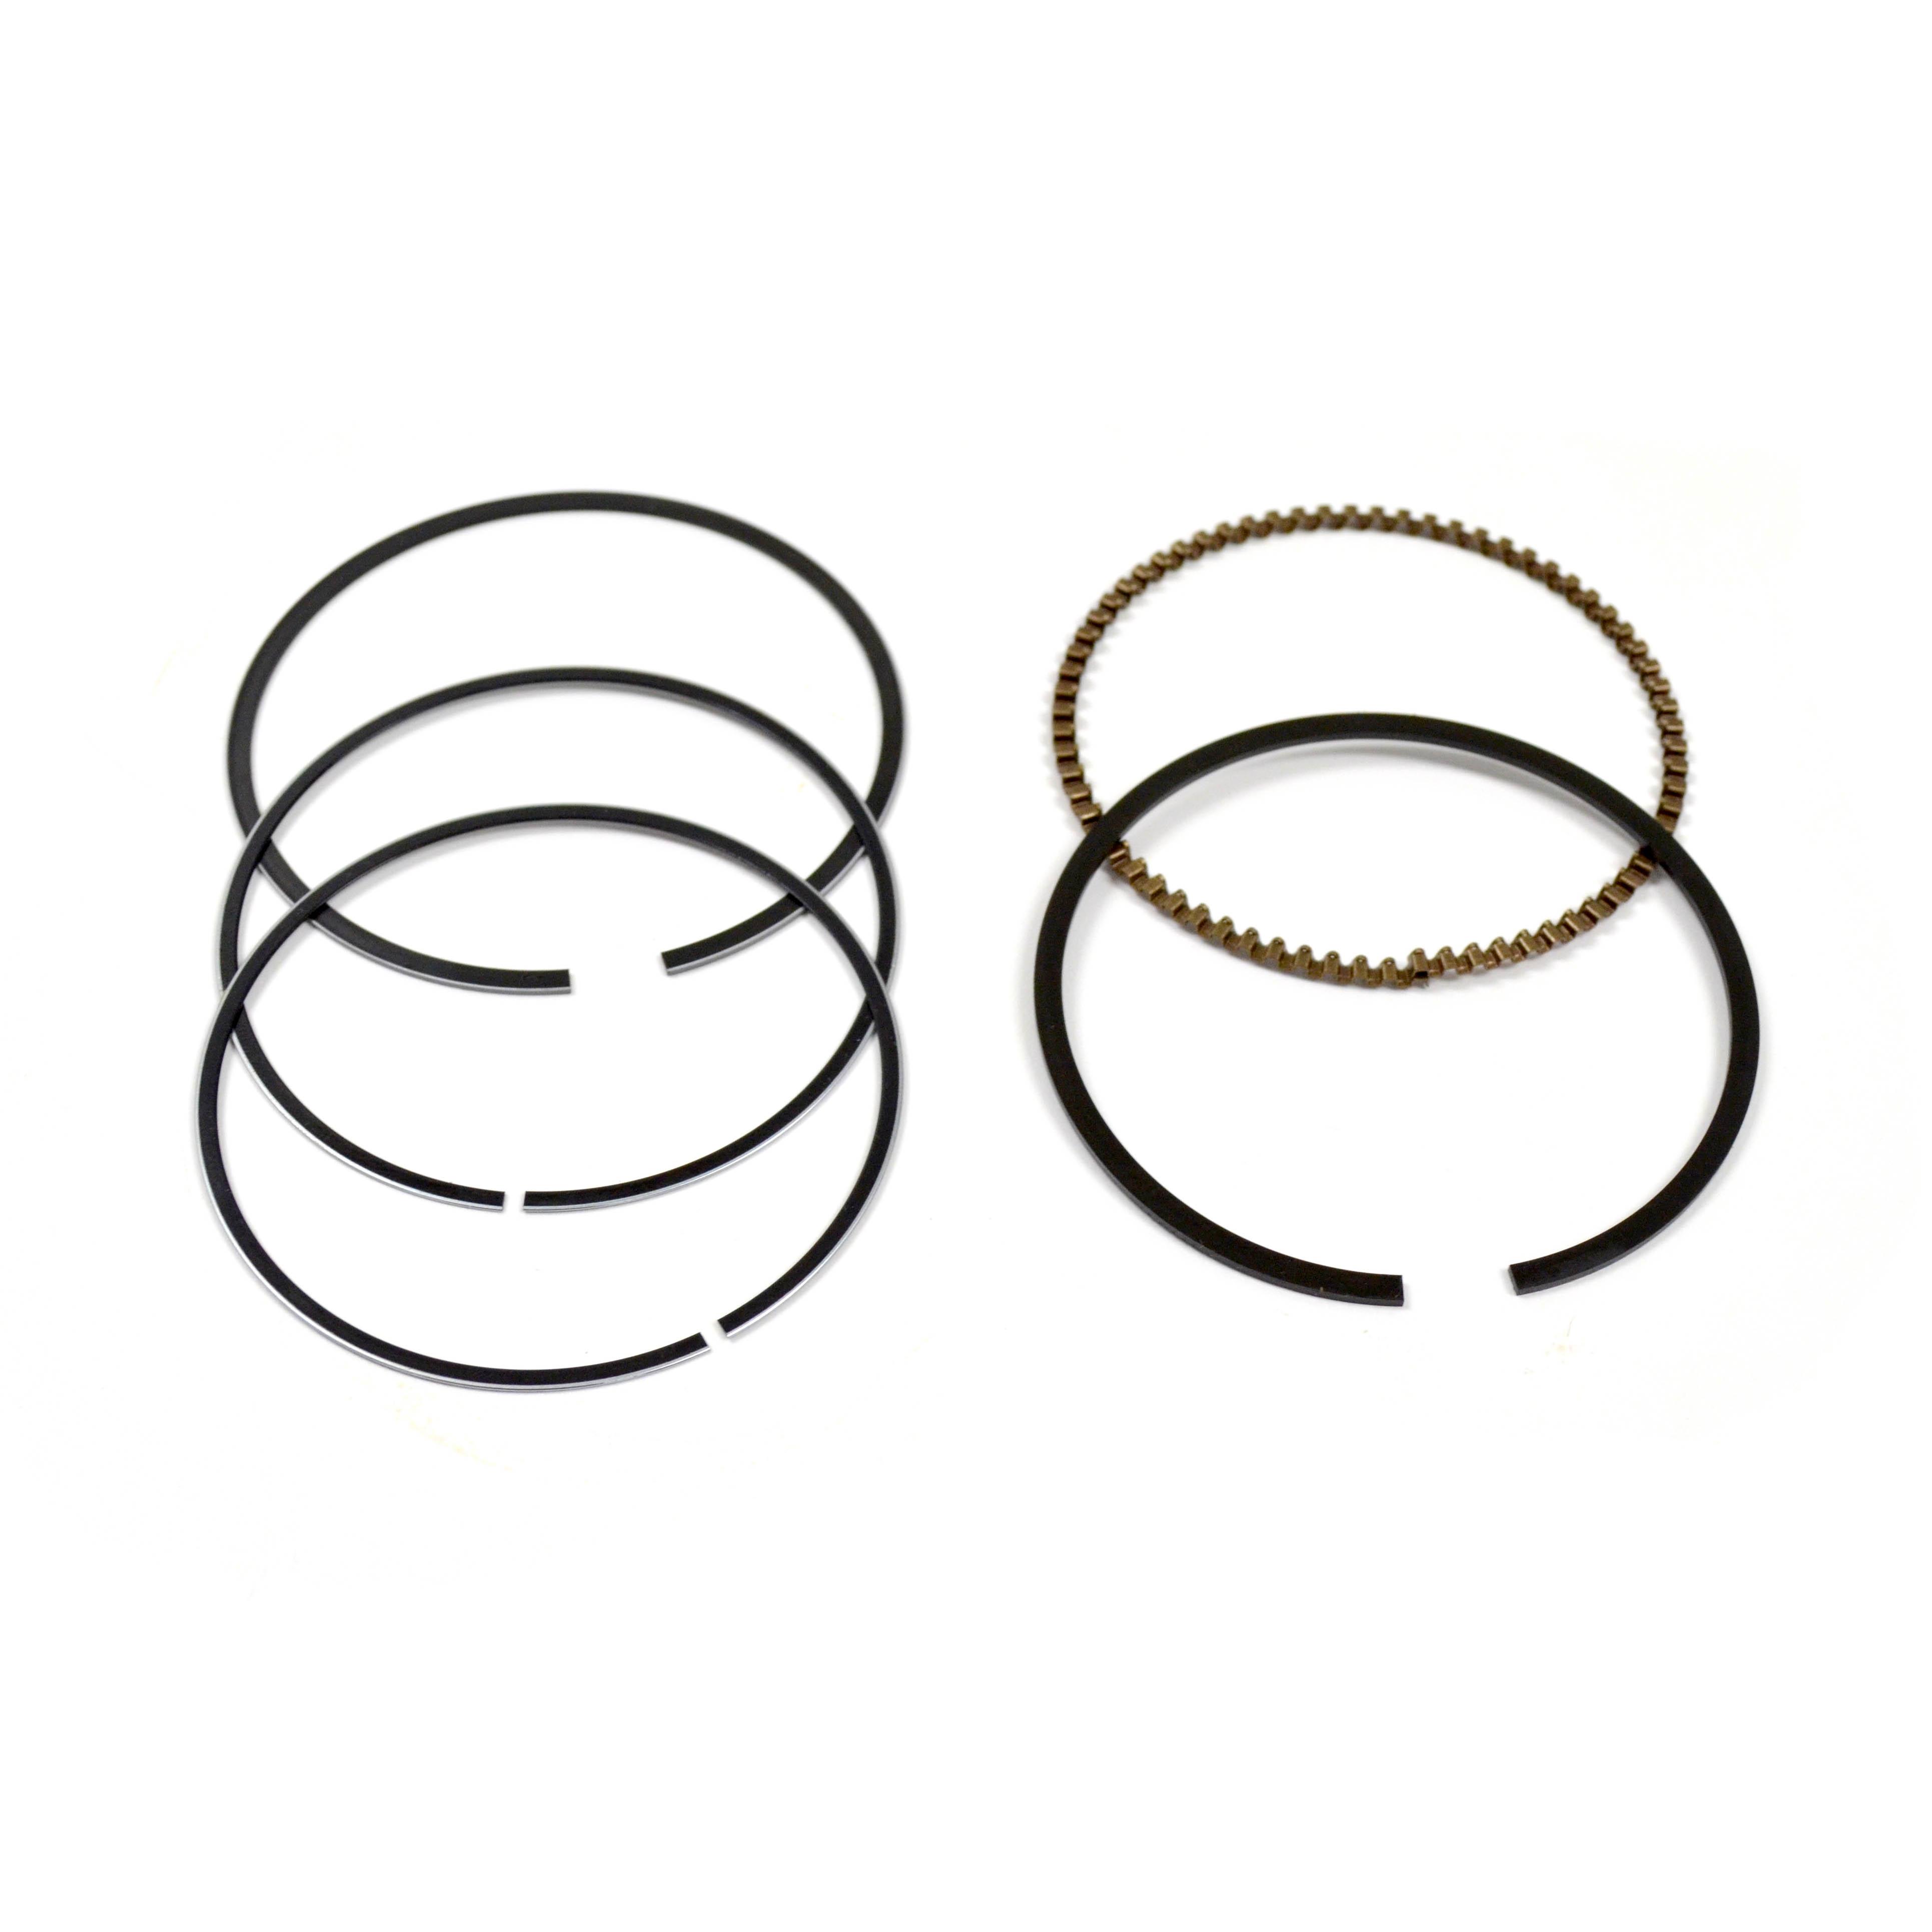 Kawasaki Bayou Piston Rings